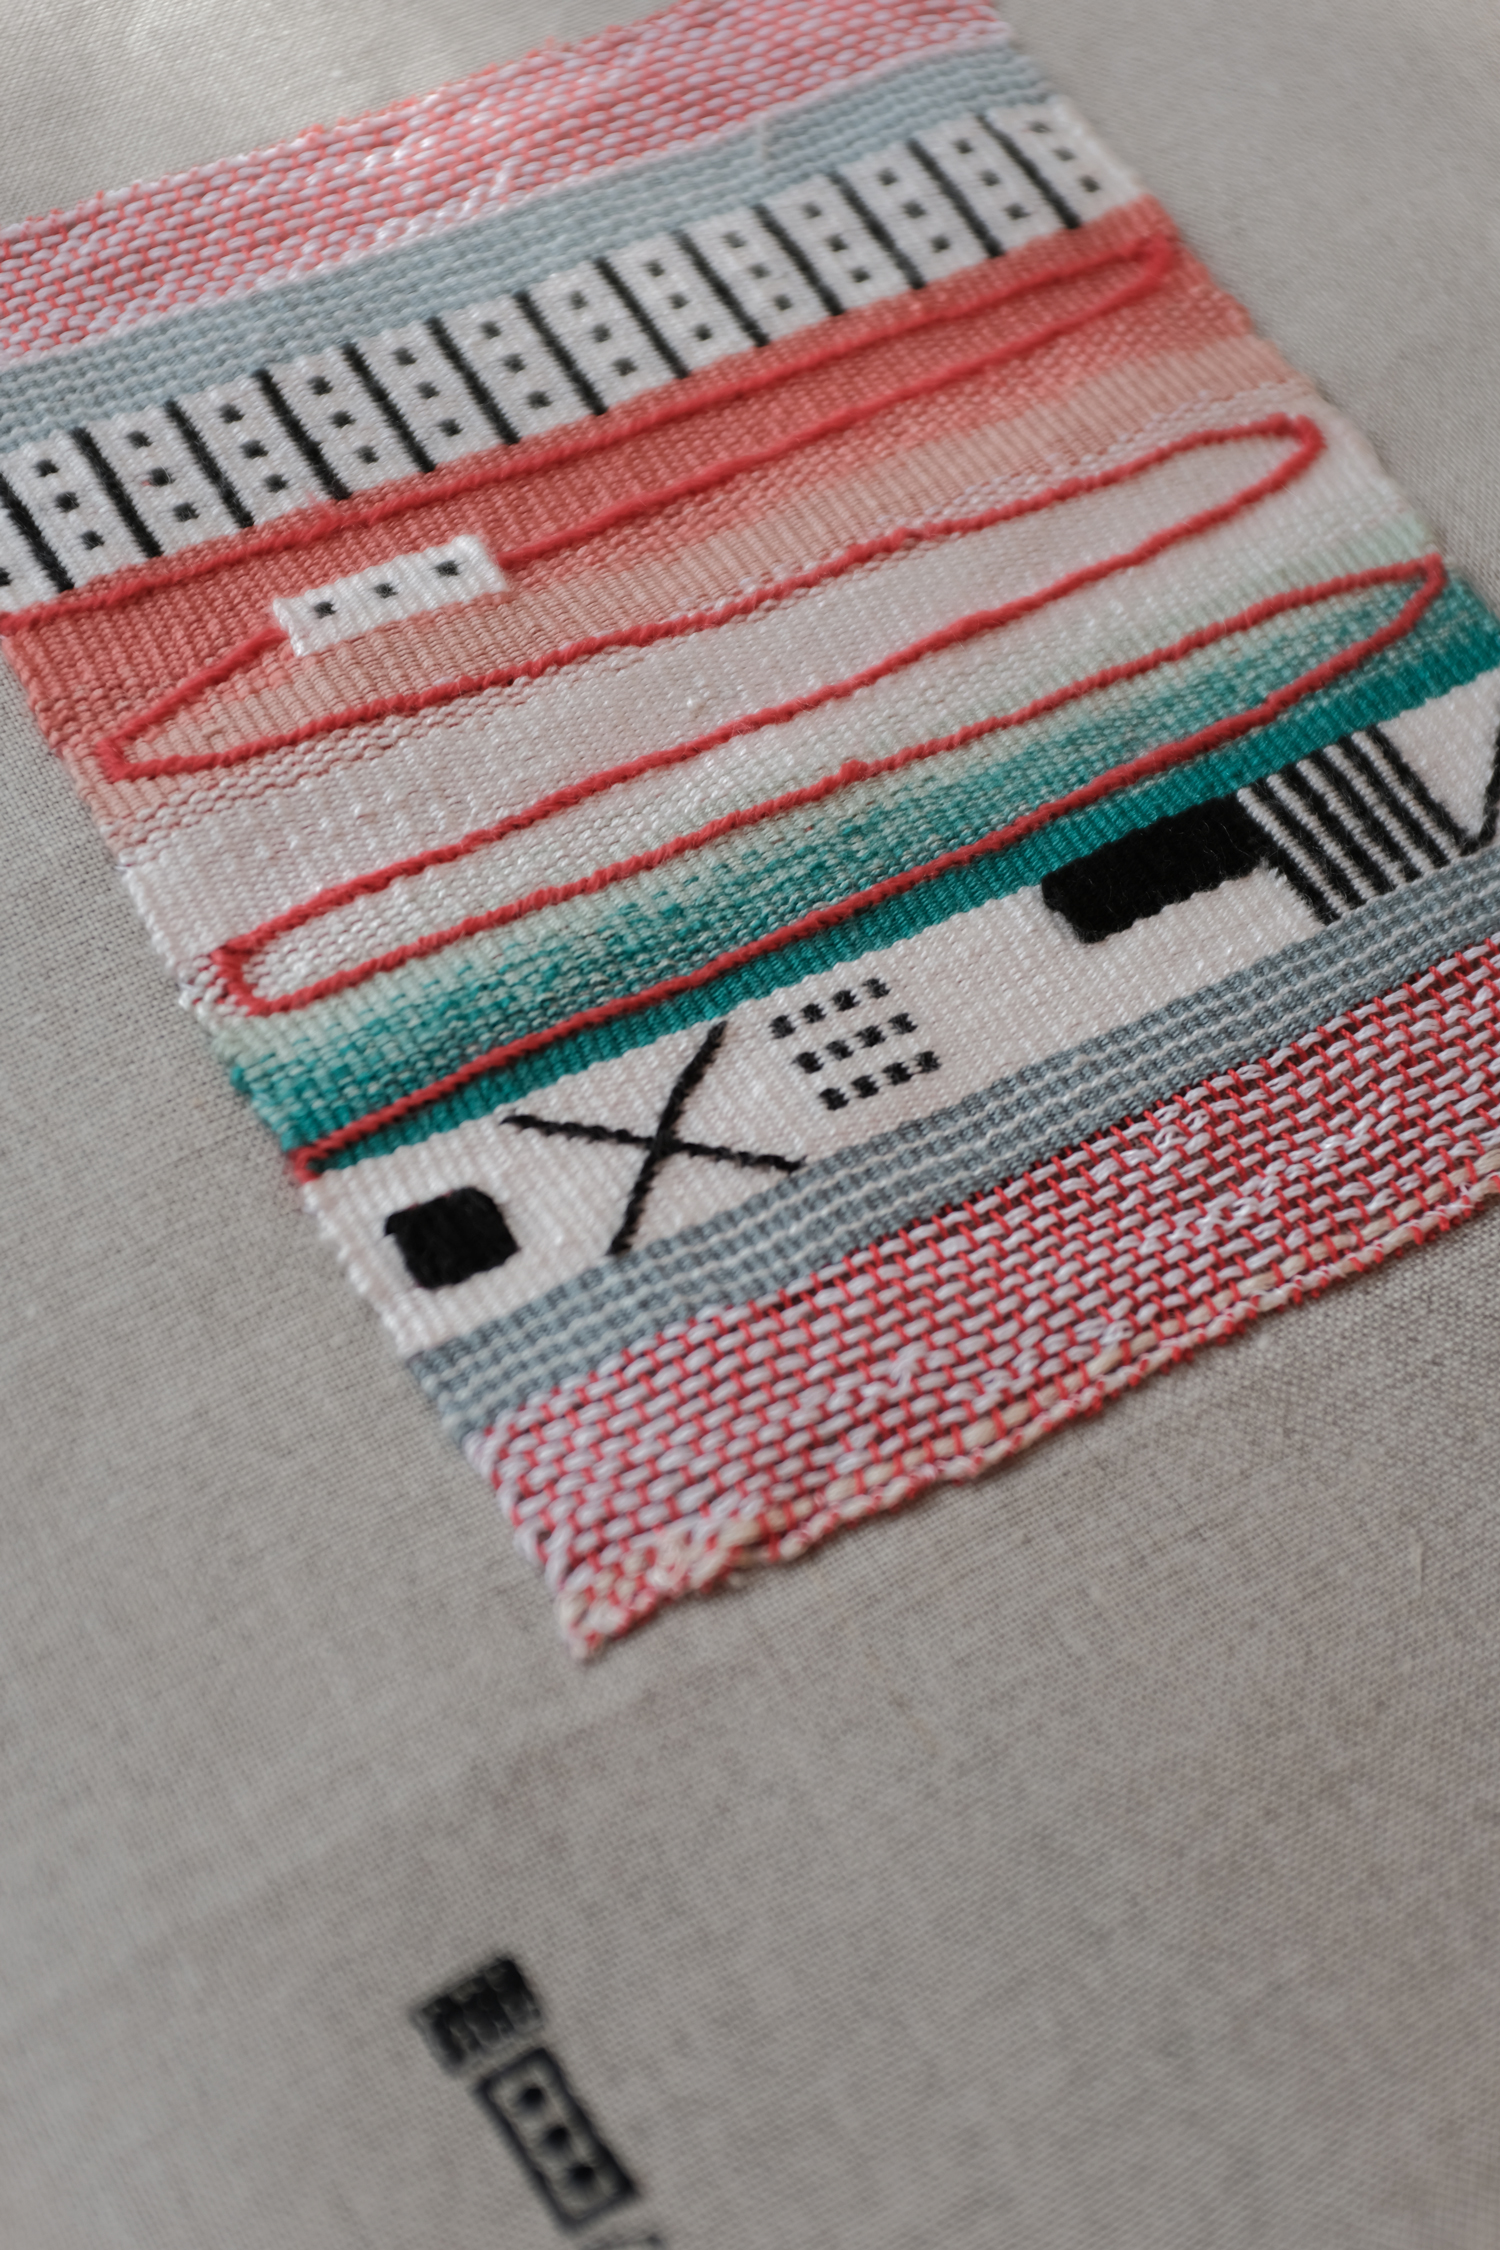 Baja Weaving series – Tijuana Kindness